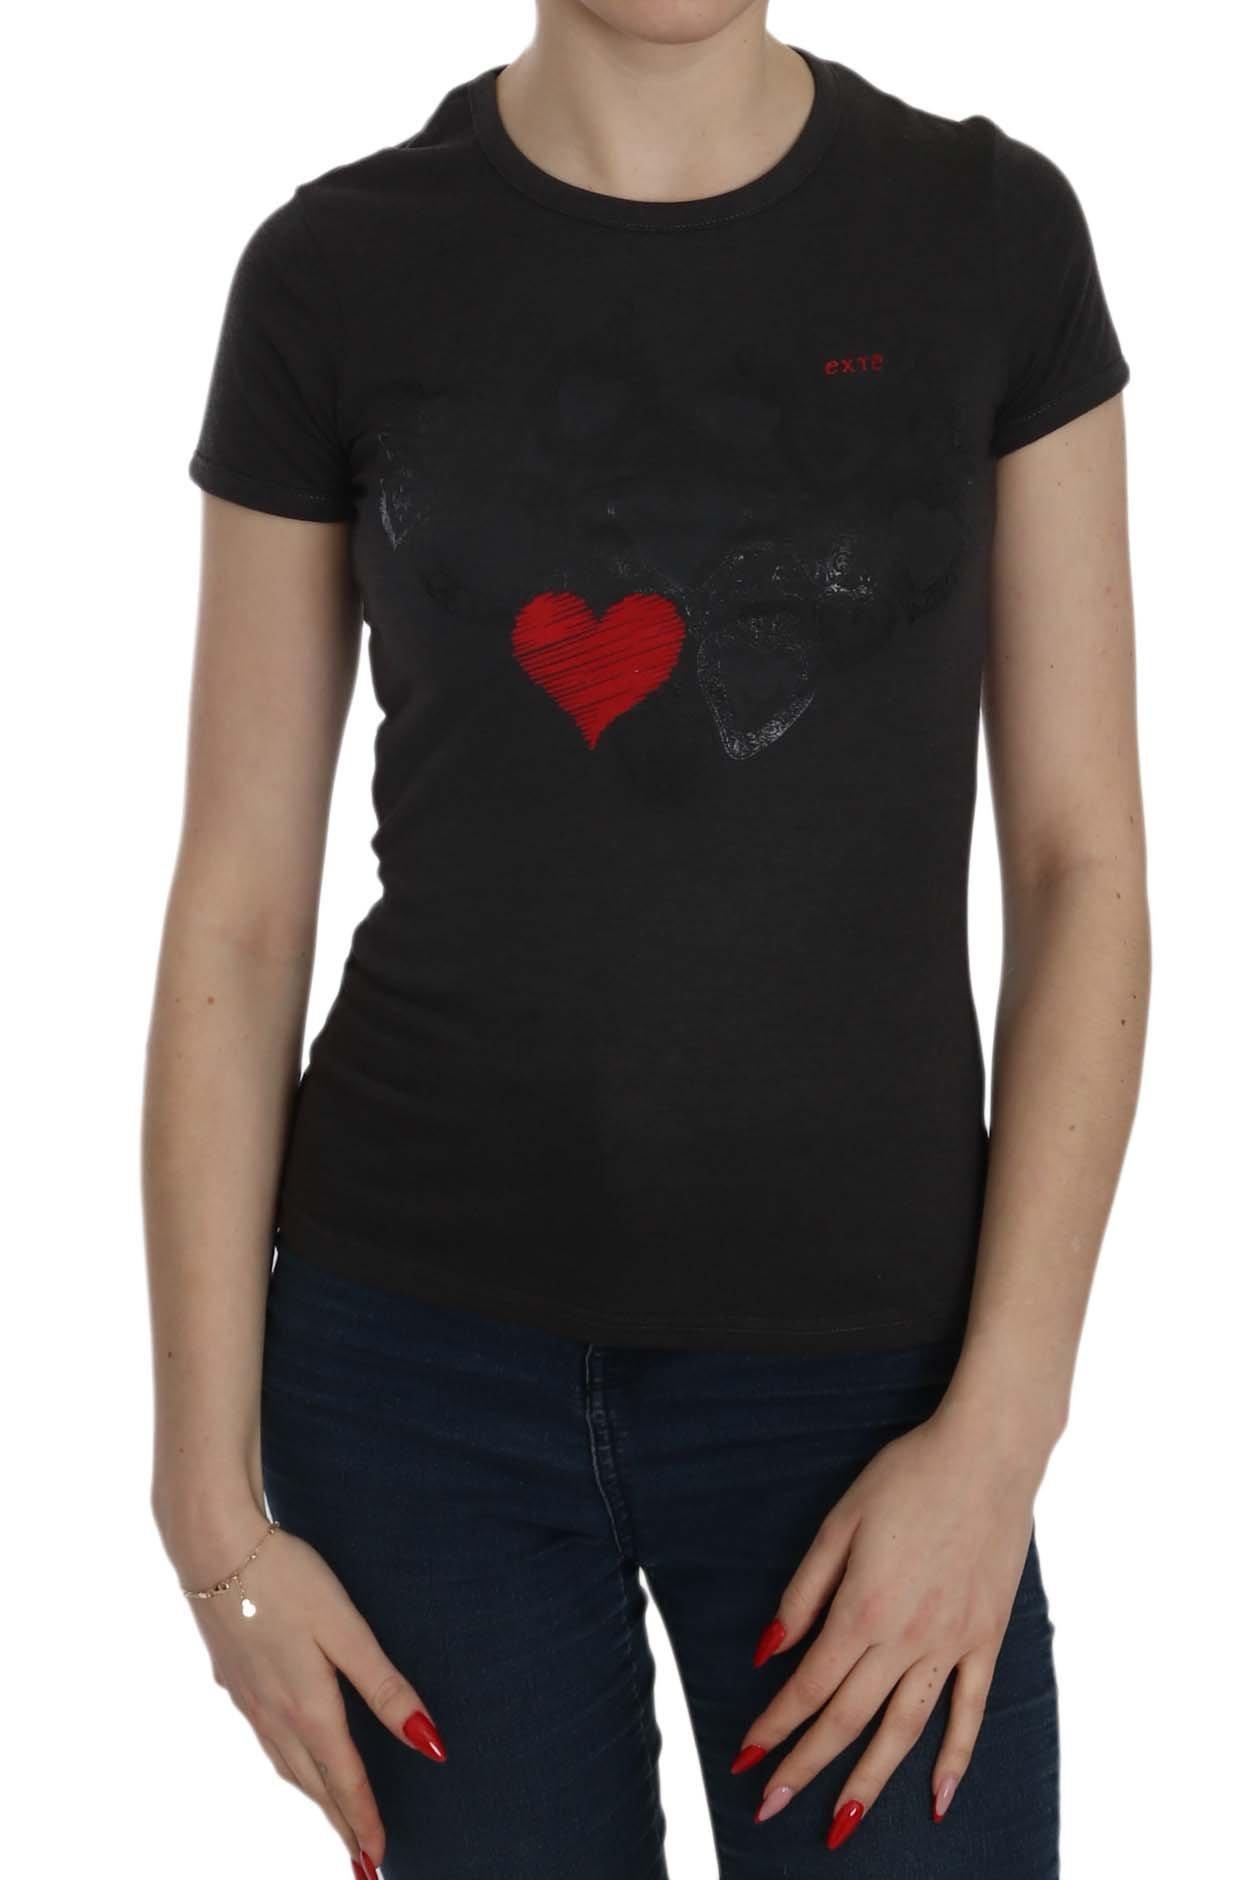 Exte Women's Hearts Print SS Casual Shirt Top Black TSH3910 - IT42|M